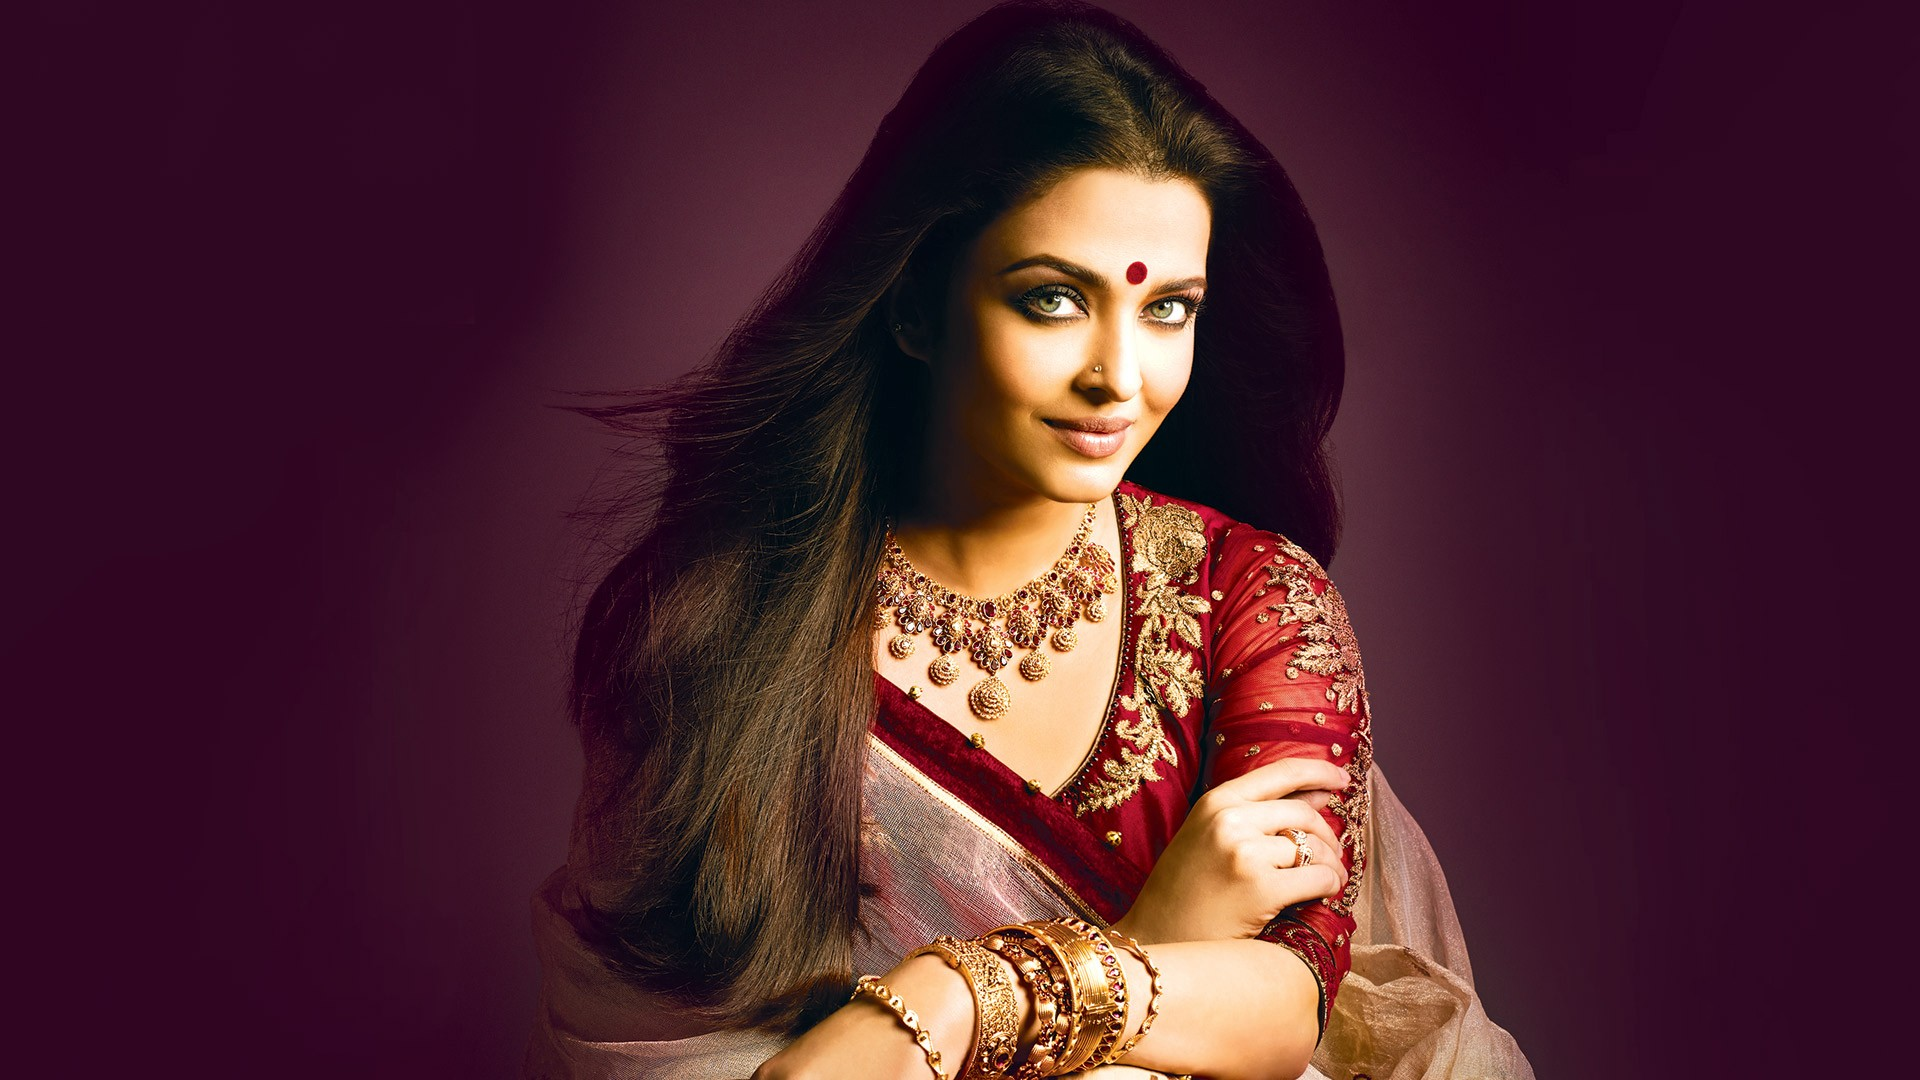 aishwarya rai 3, hd indian celebrities, 4k wallpapers, images